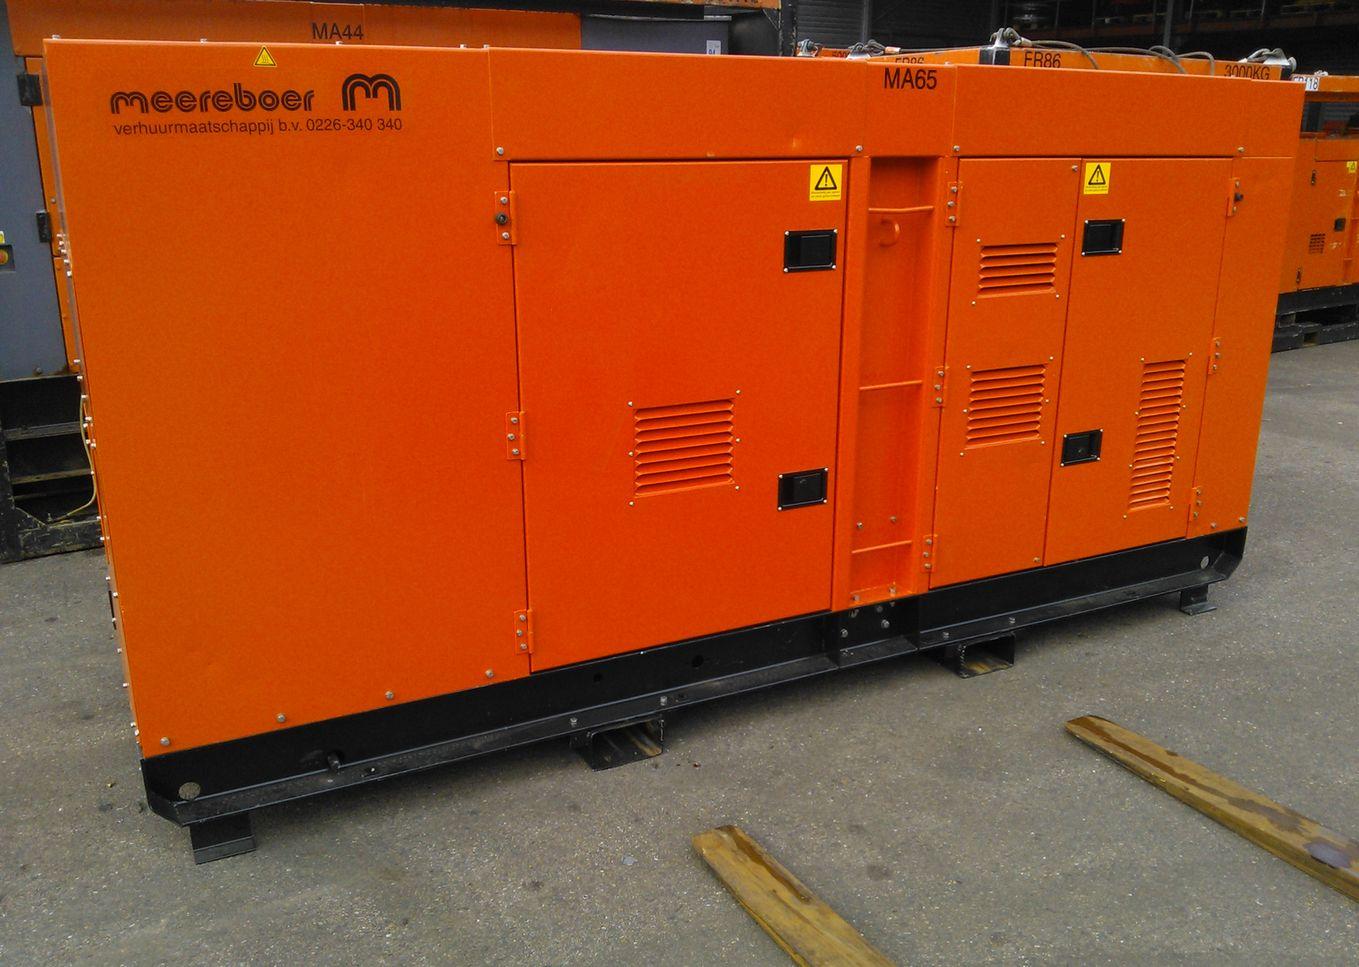 Generatoren Image